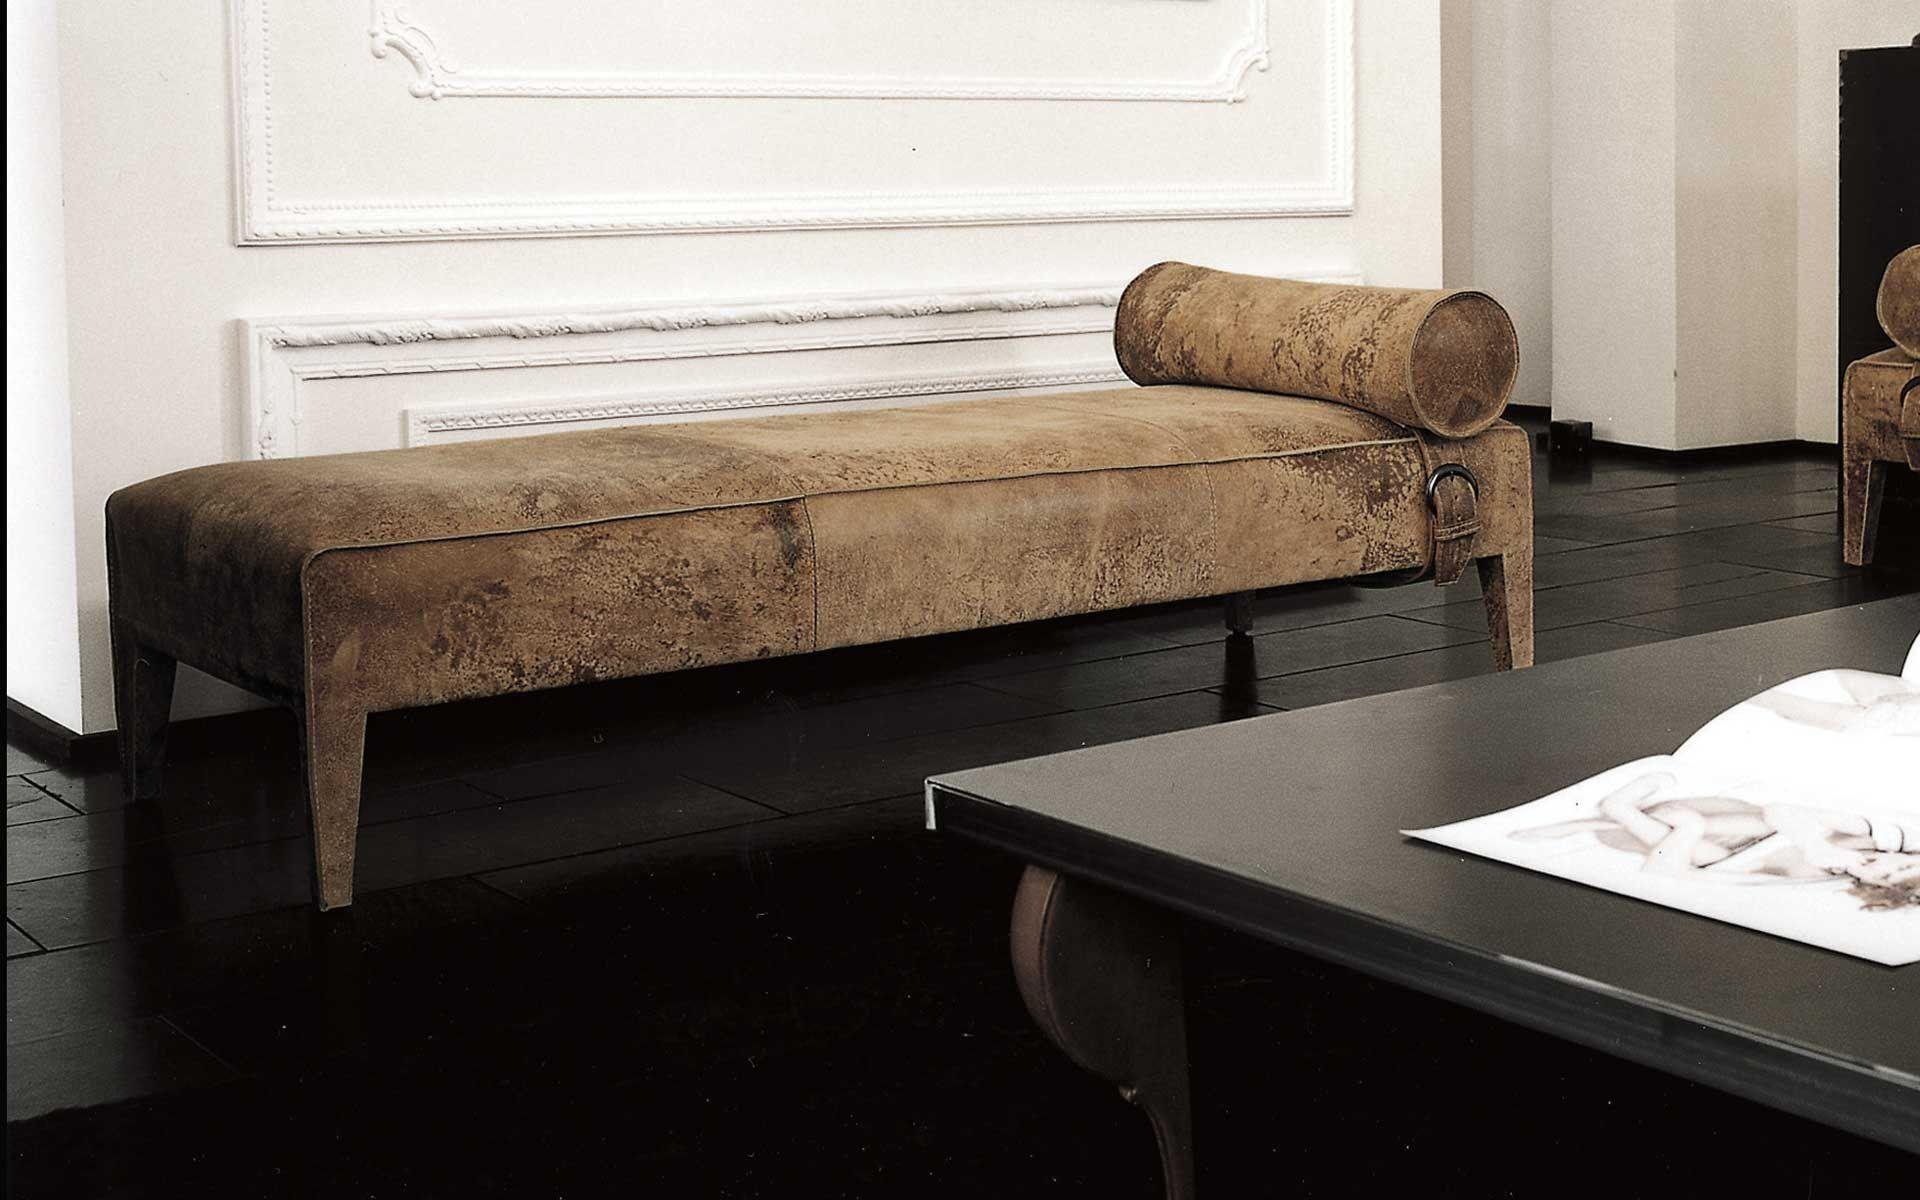 Long chaise Baxter FREUD zastupuje Stokist